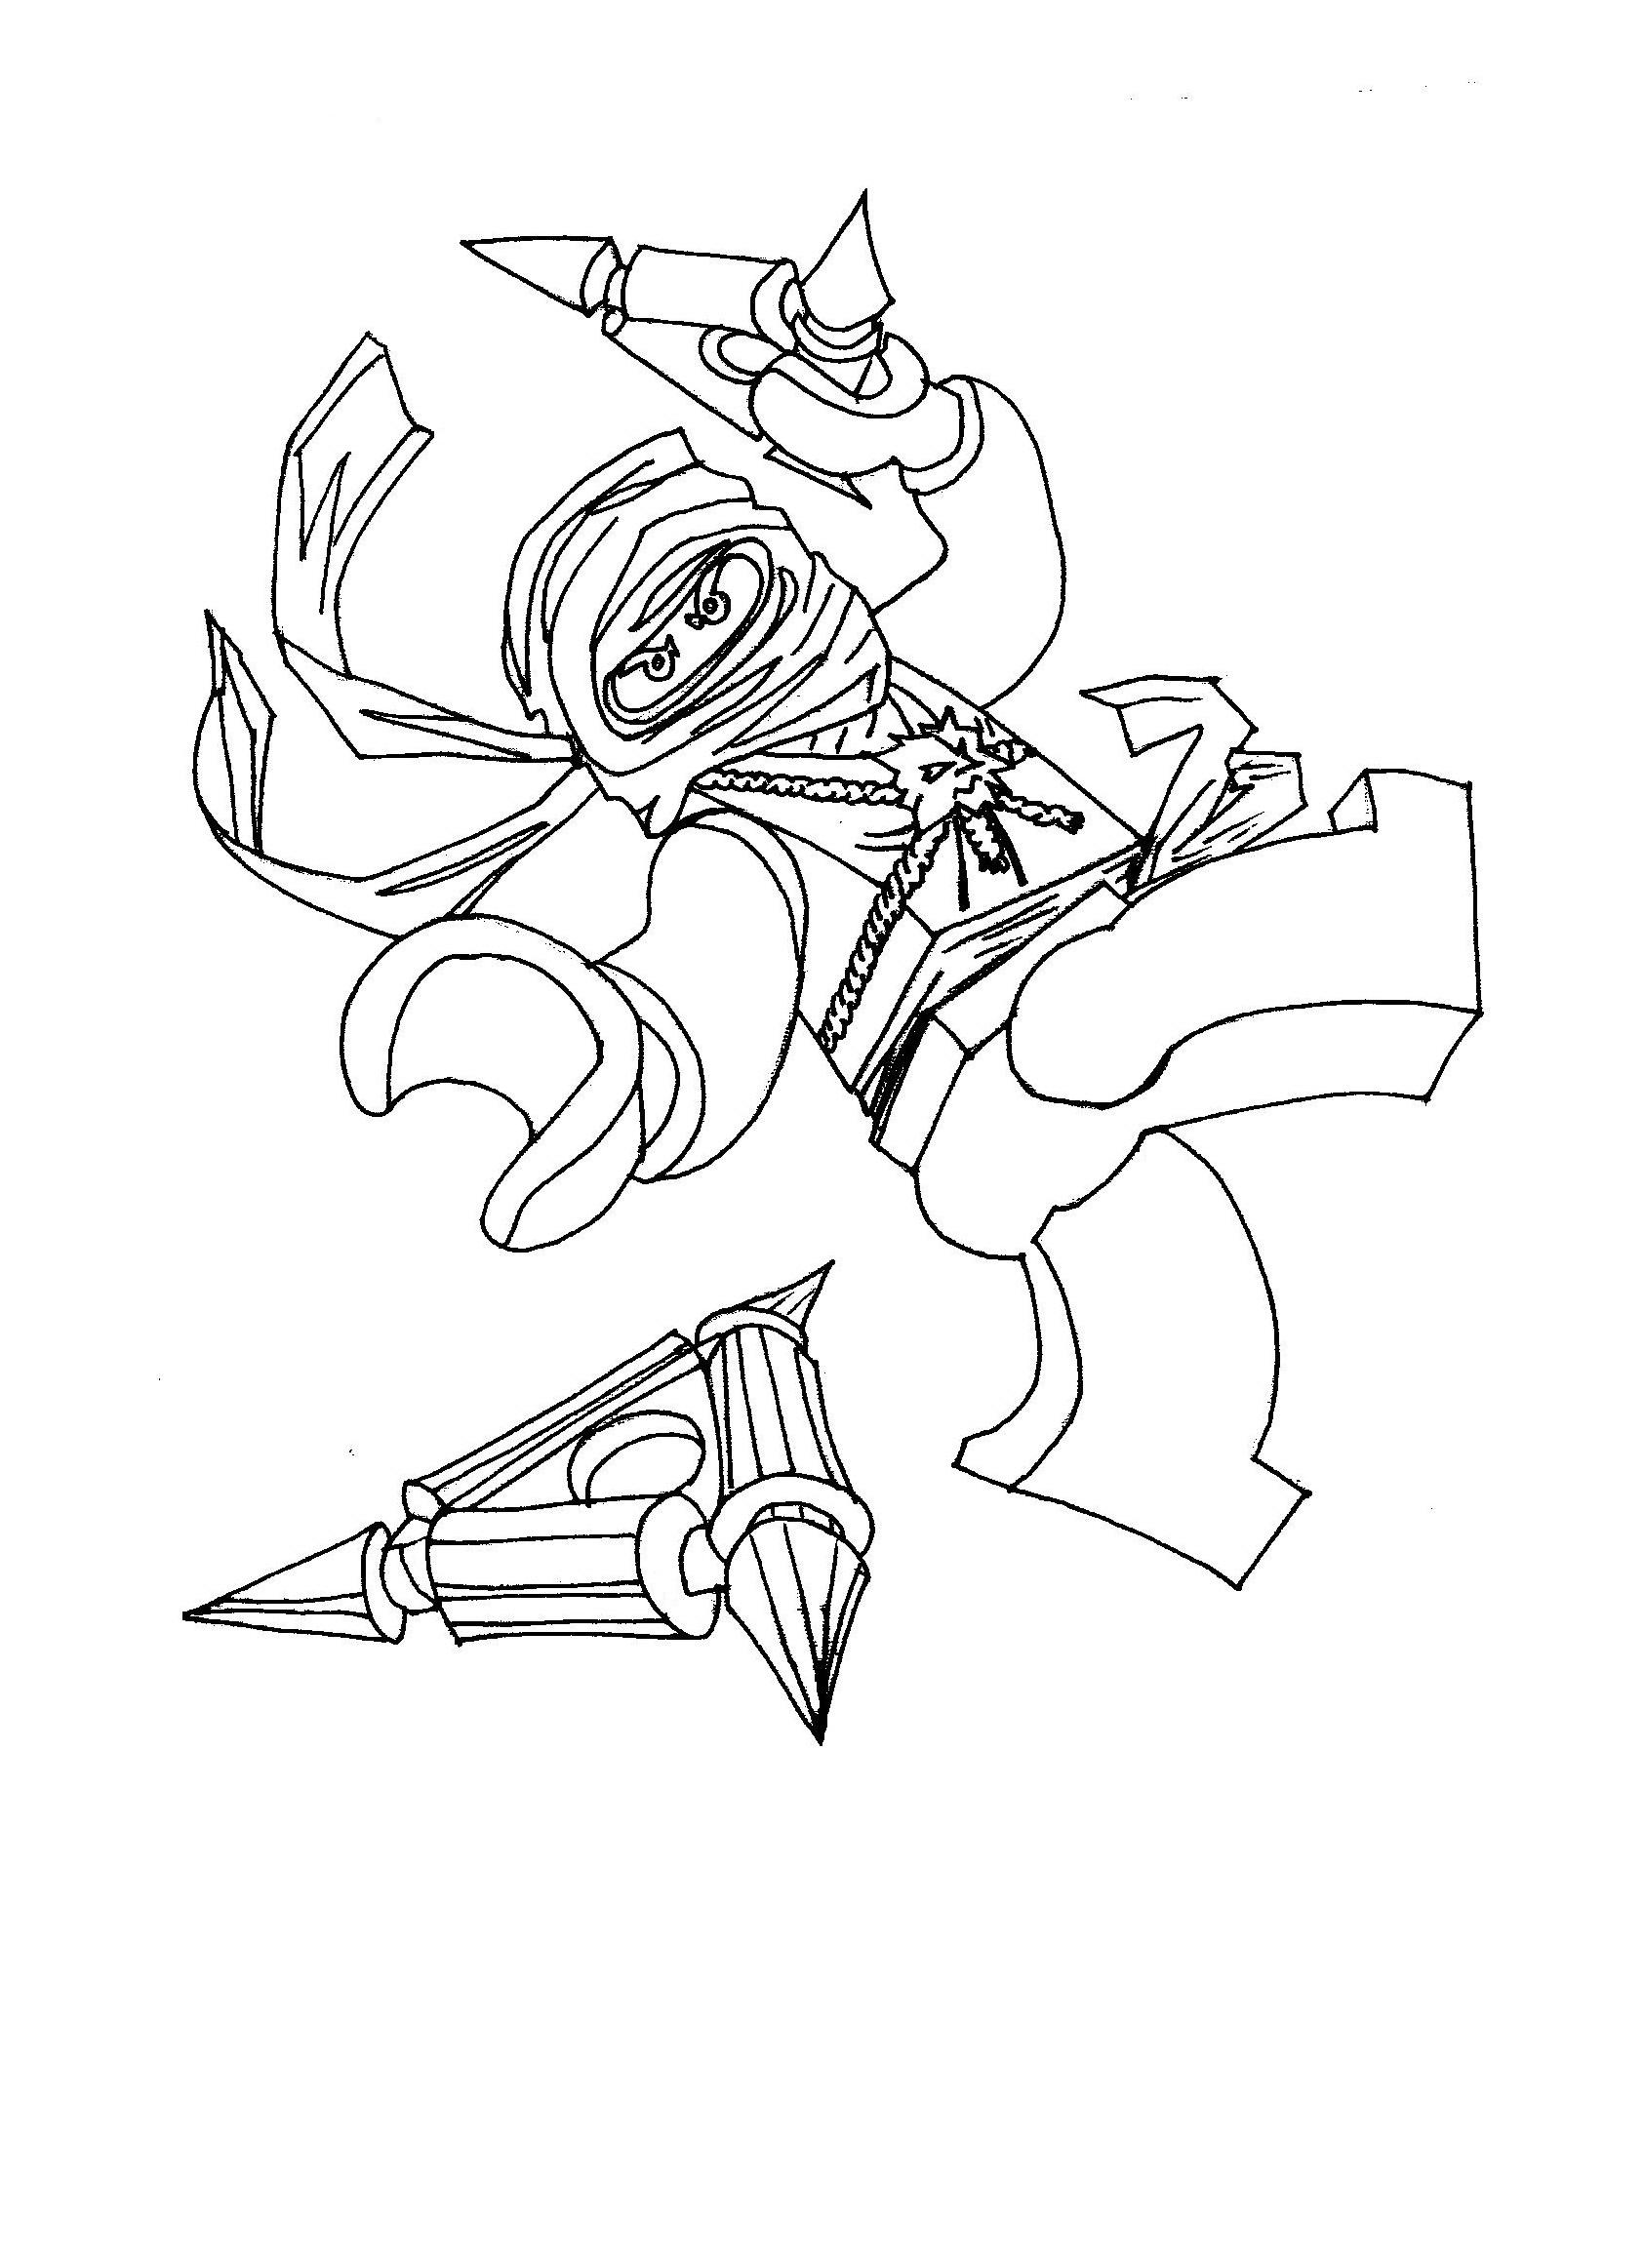 jay ninjago coloring pages - free printable ninjago coloring pages for kids